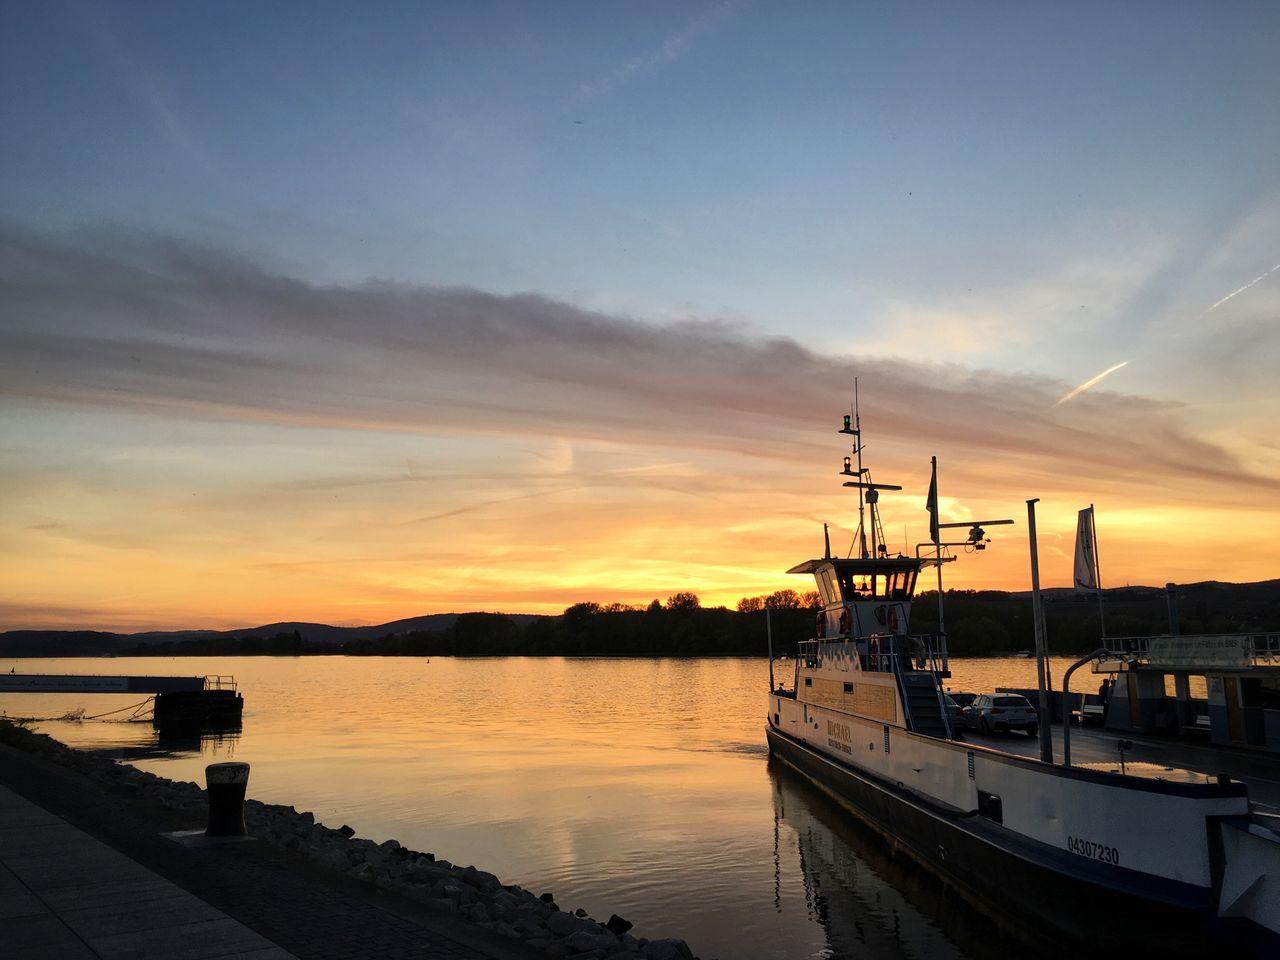 Rhein Sonnenuntergang Sunset Ferry Ingelheim enjoyed a wonderful sunset :) beautiful every time again and again